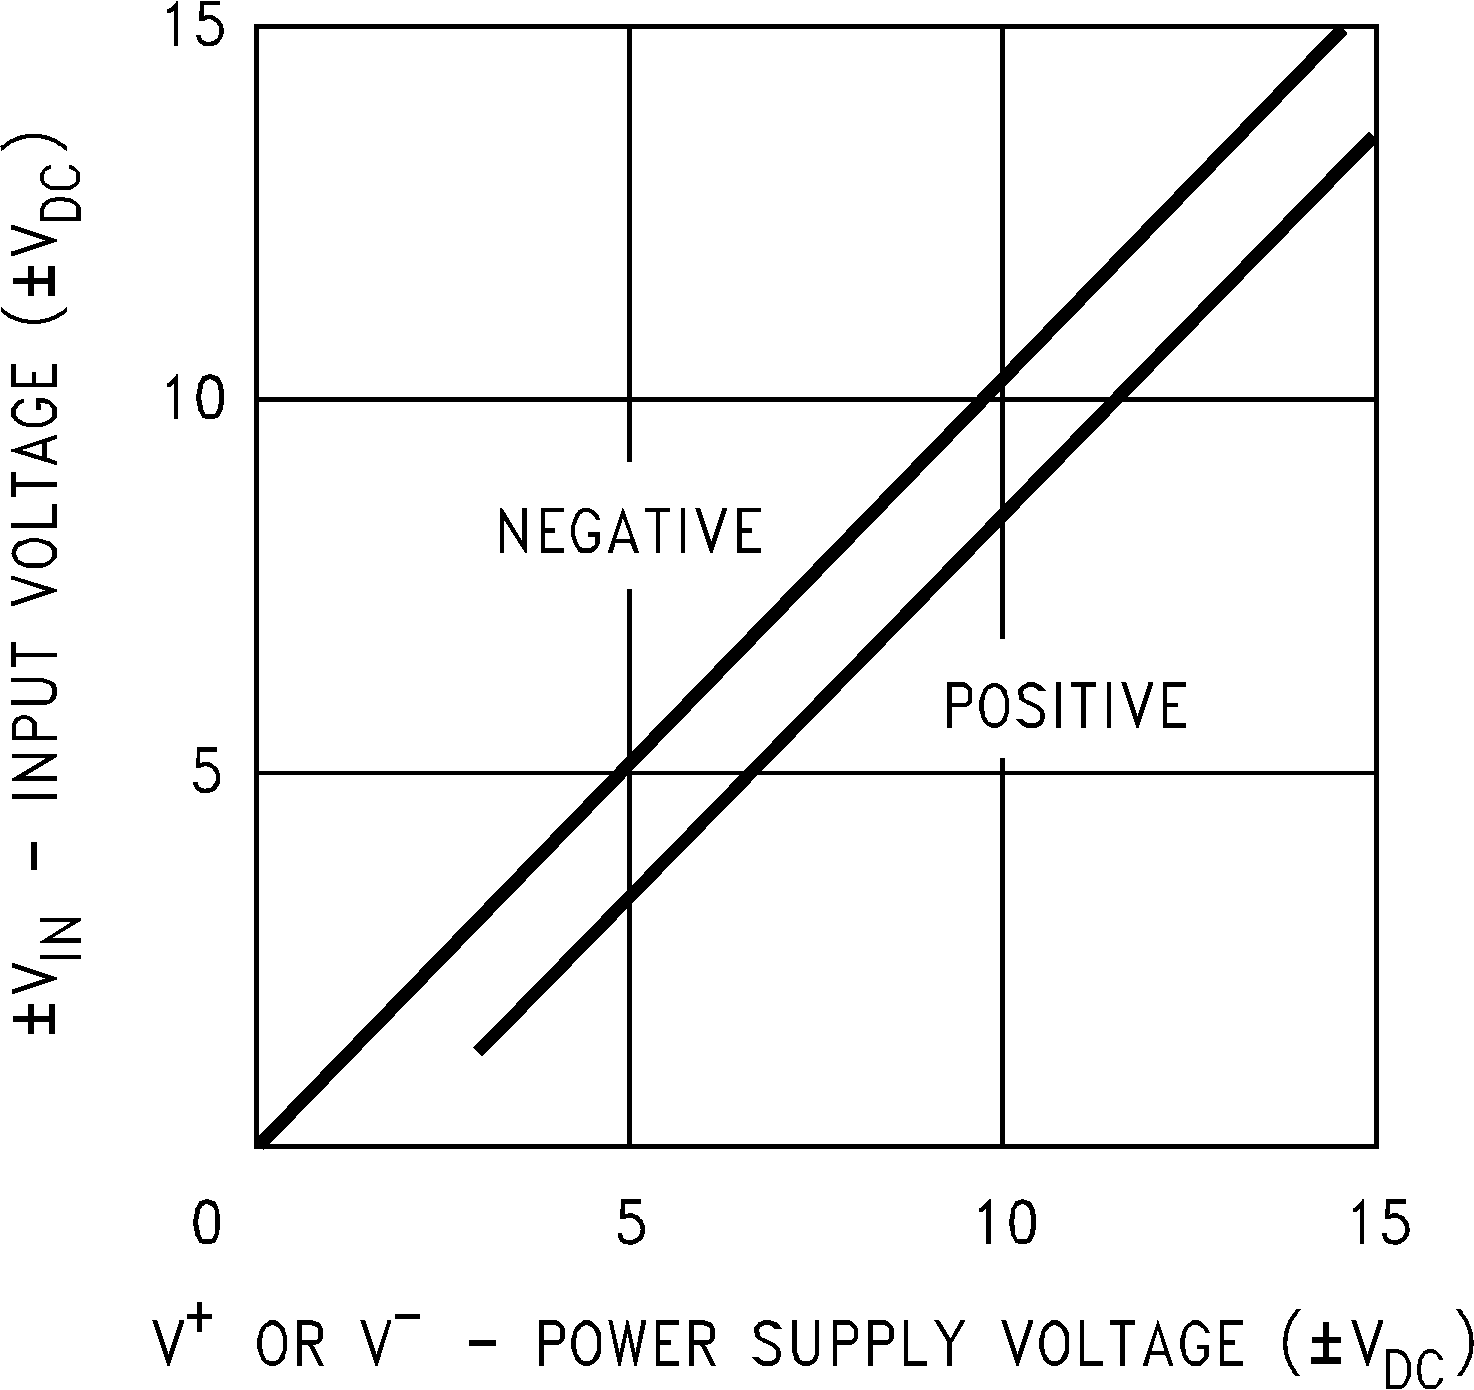 Lm324 N Single Dual Power Generalpurpose Quad Op Amp Circuit Diagram Lm124 Lm224 Lm2902 929934